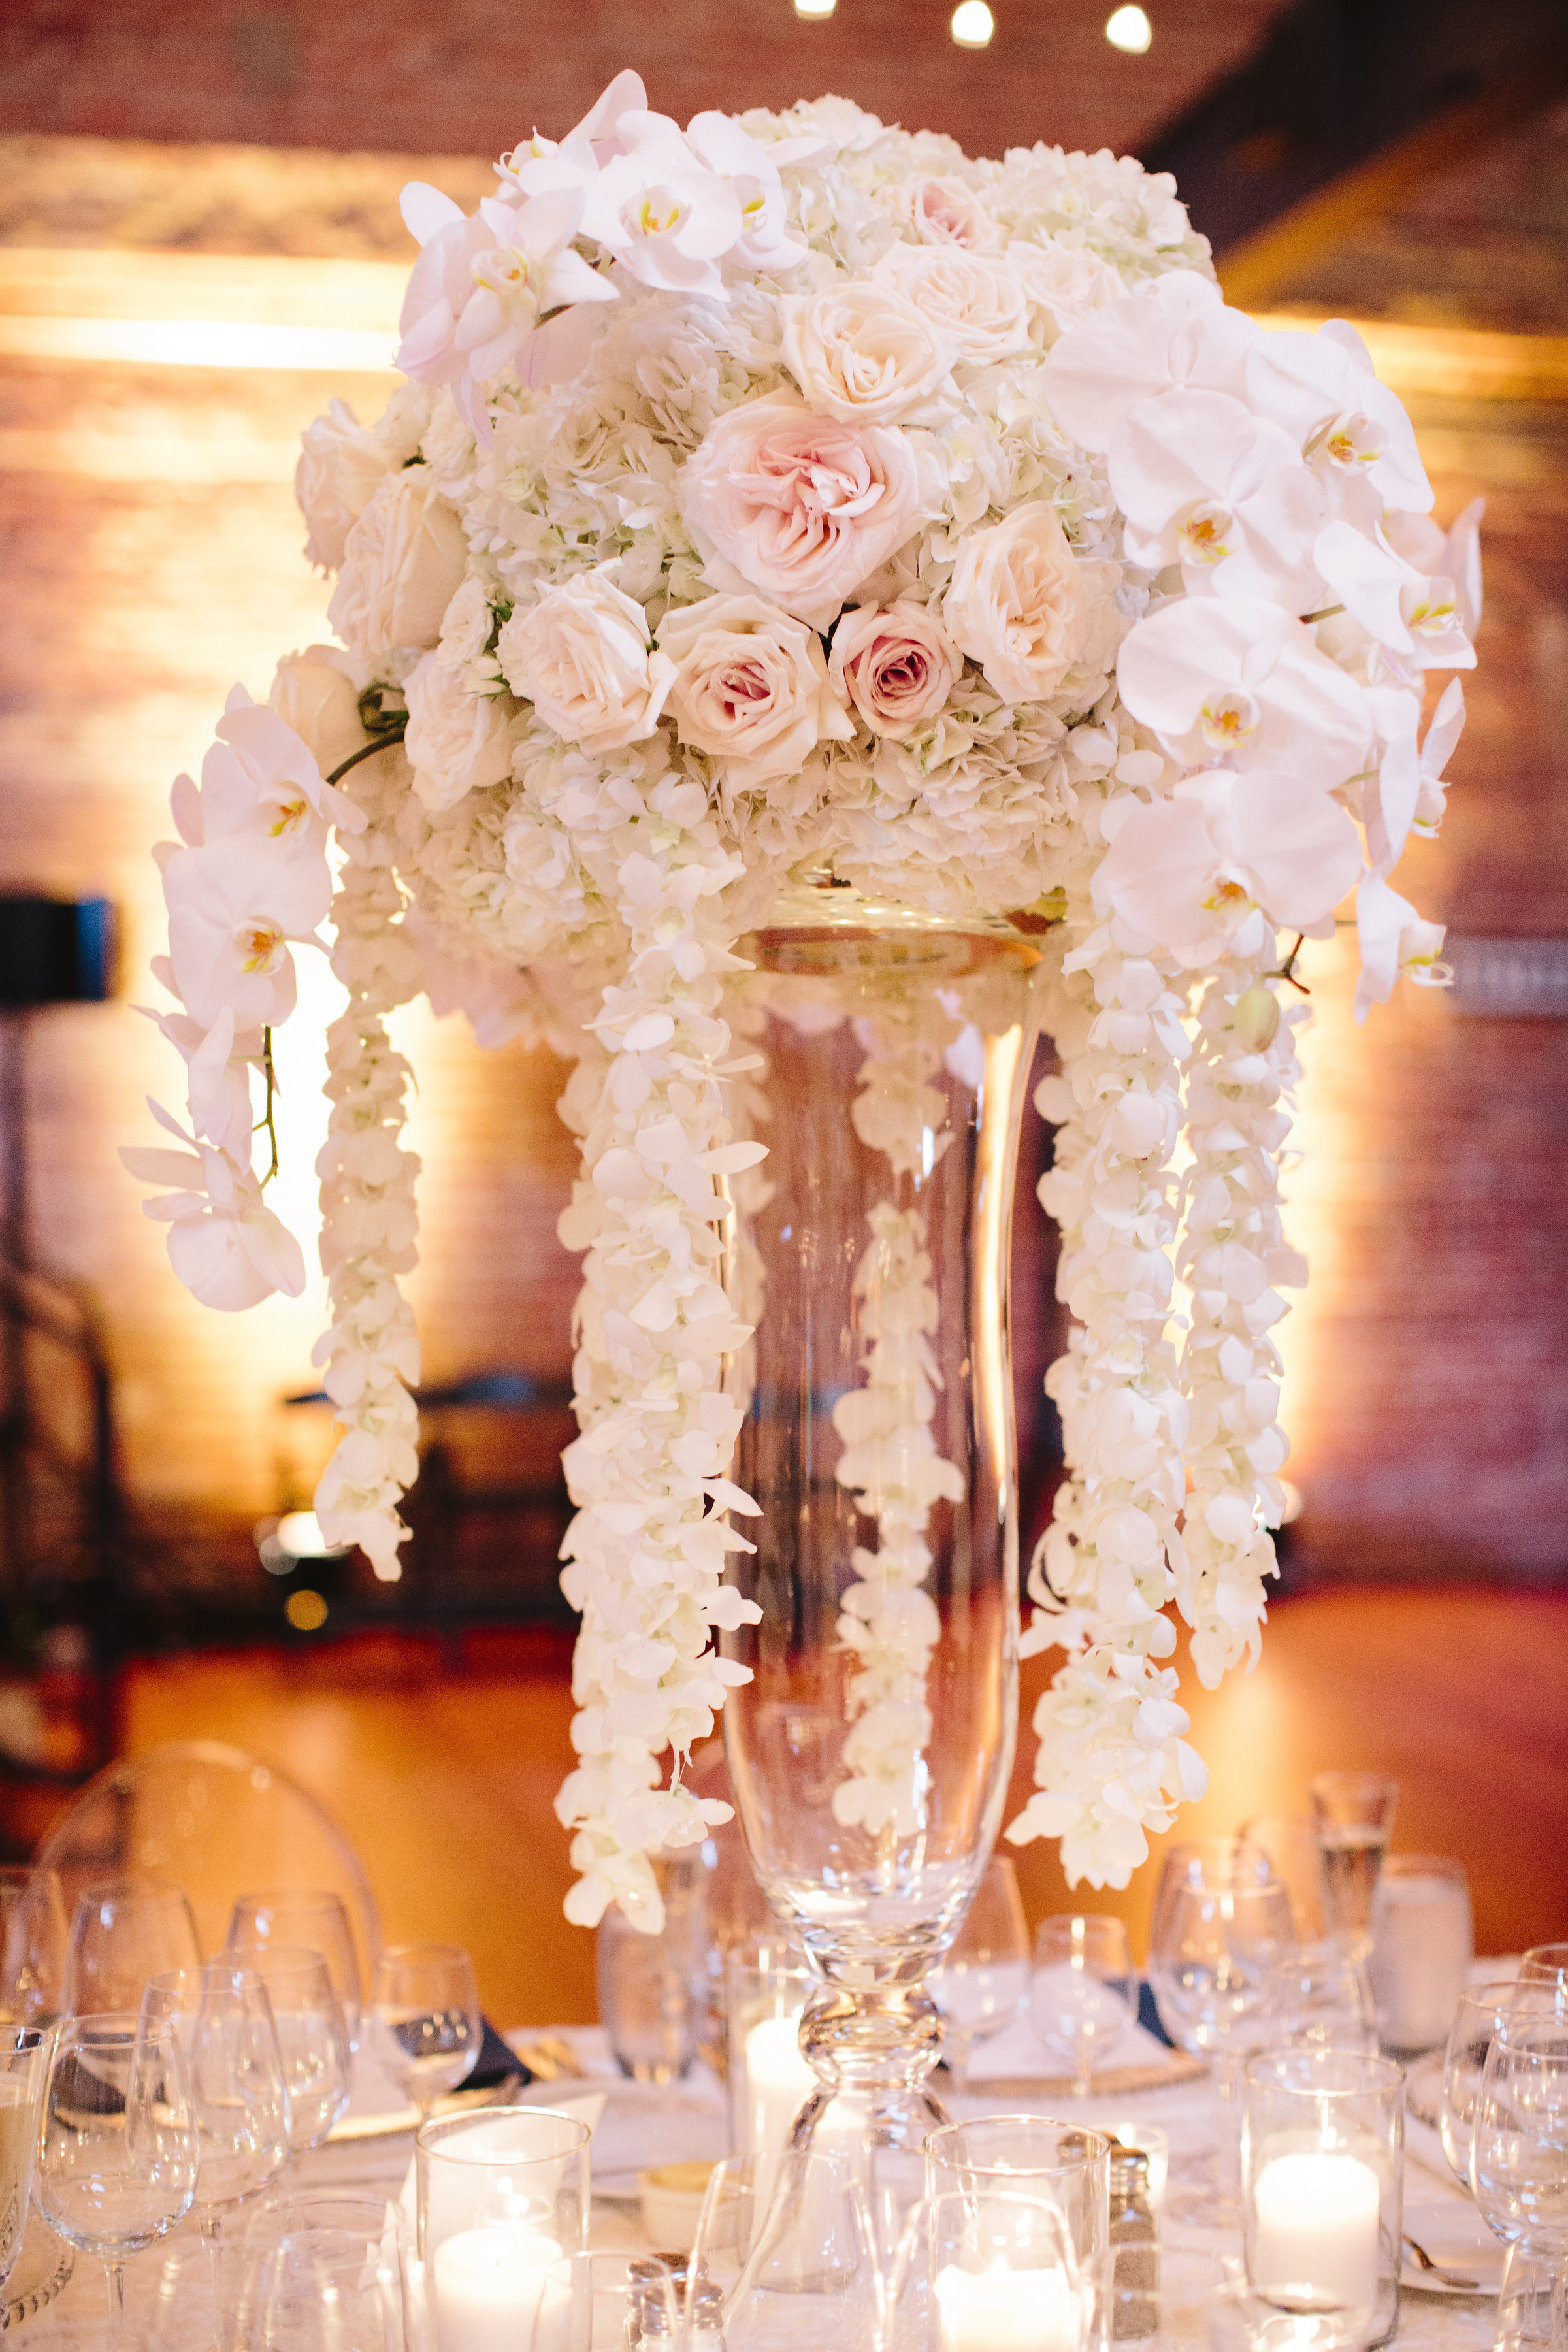 Pink and white rose cascade wedding centerpiece